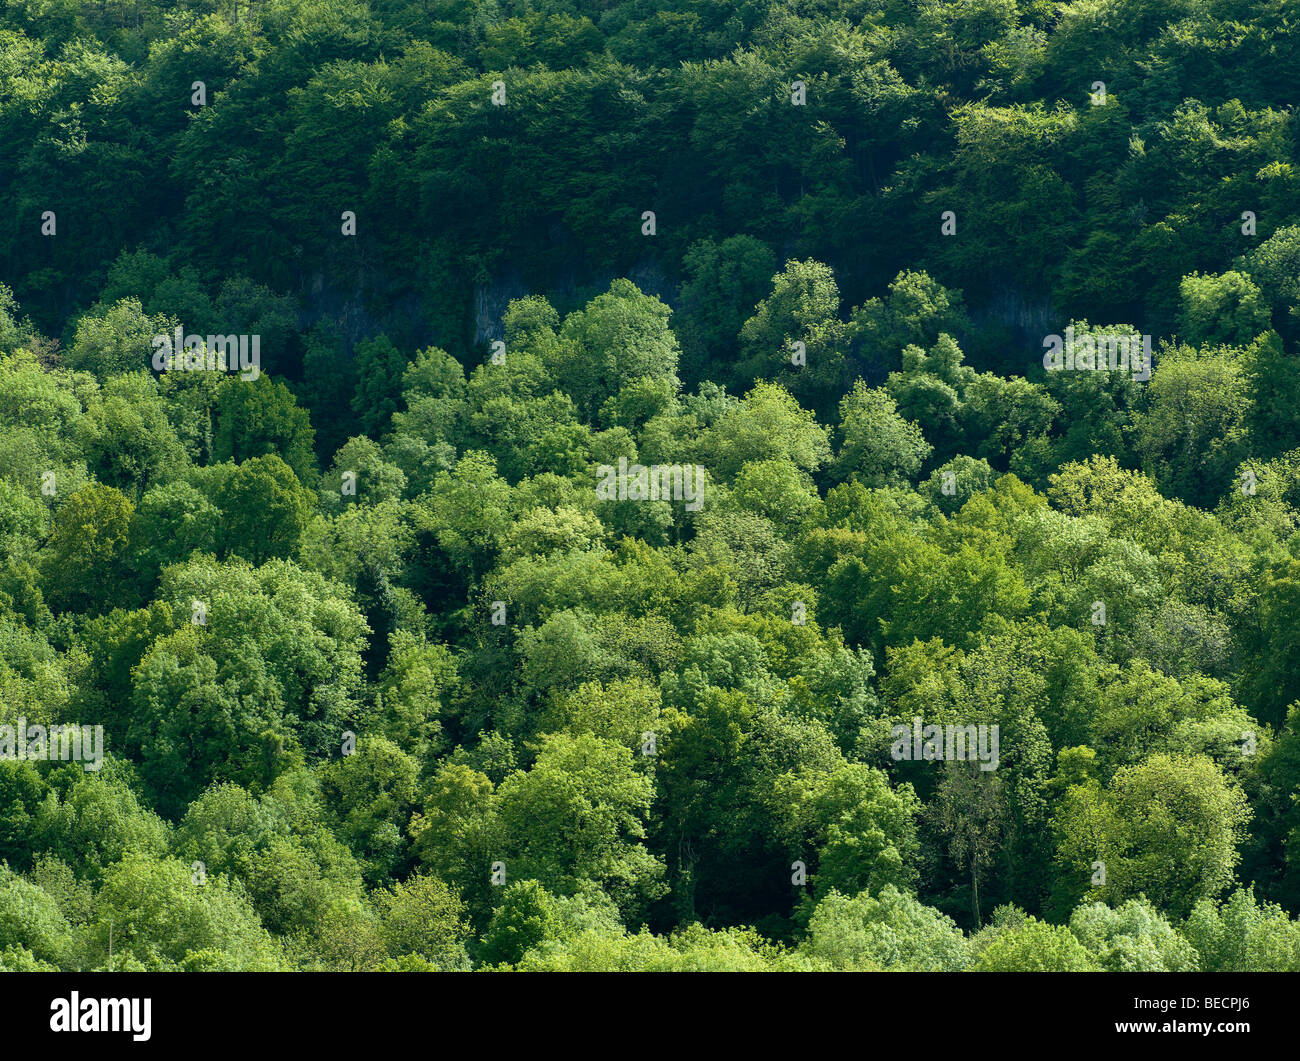 Alberi sulla banca del fiume Wye, Wye Valley, Gloucestershire Englans. Immagini Stock